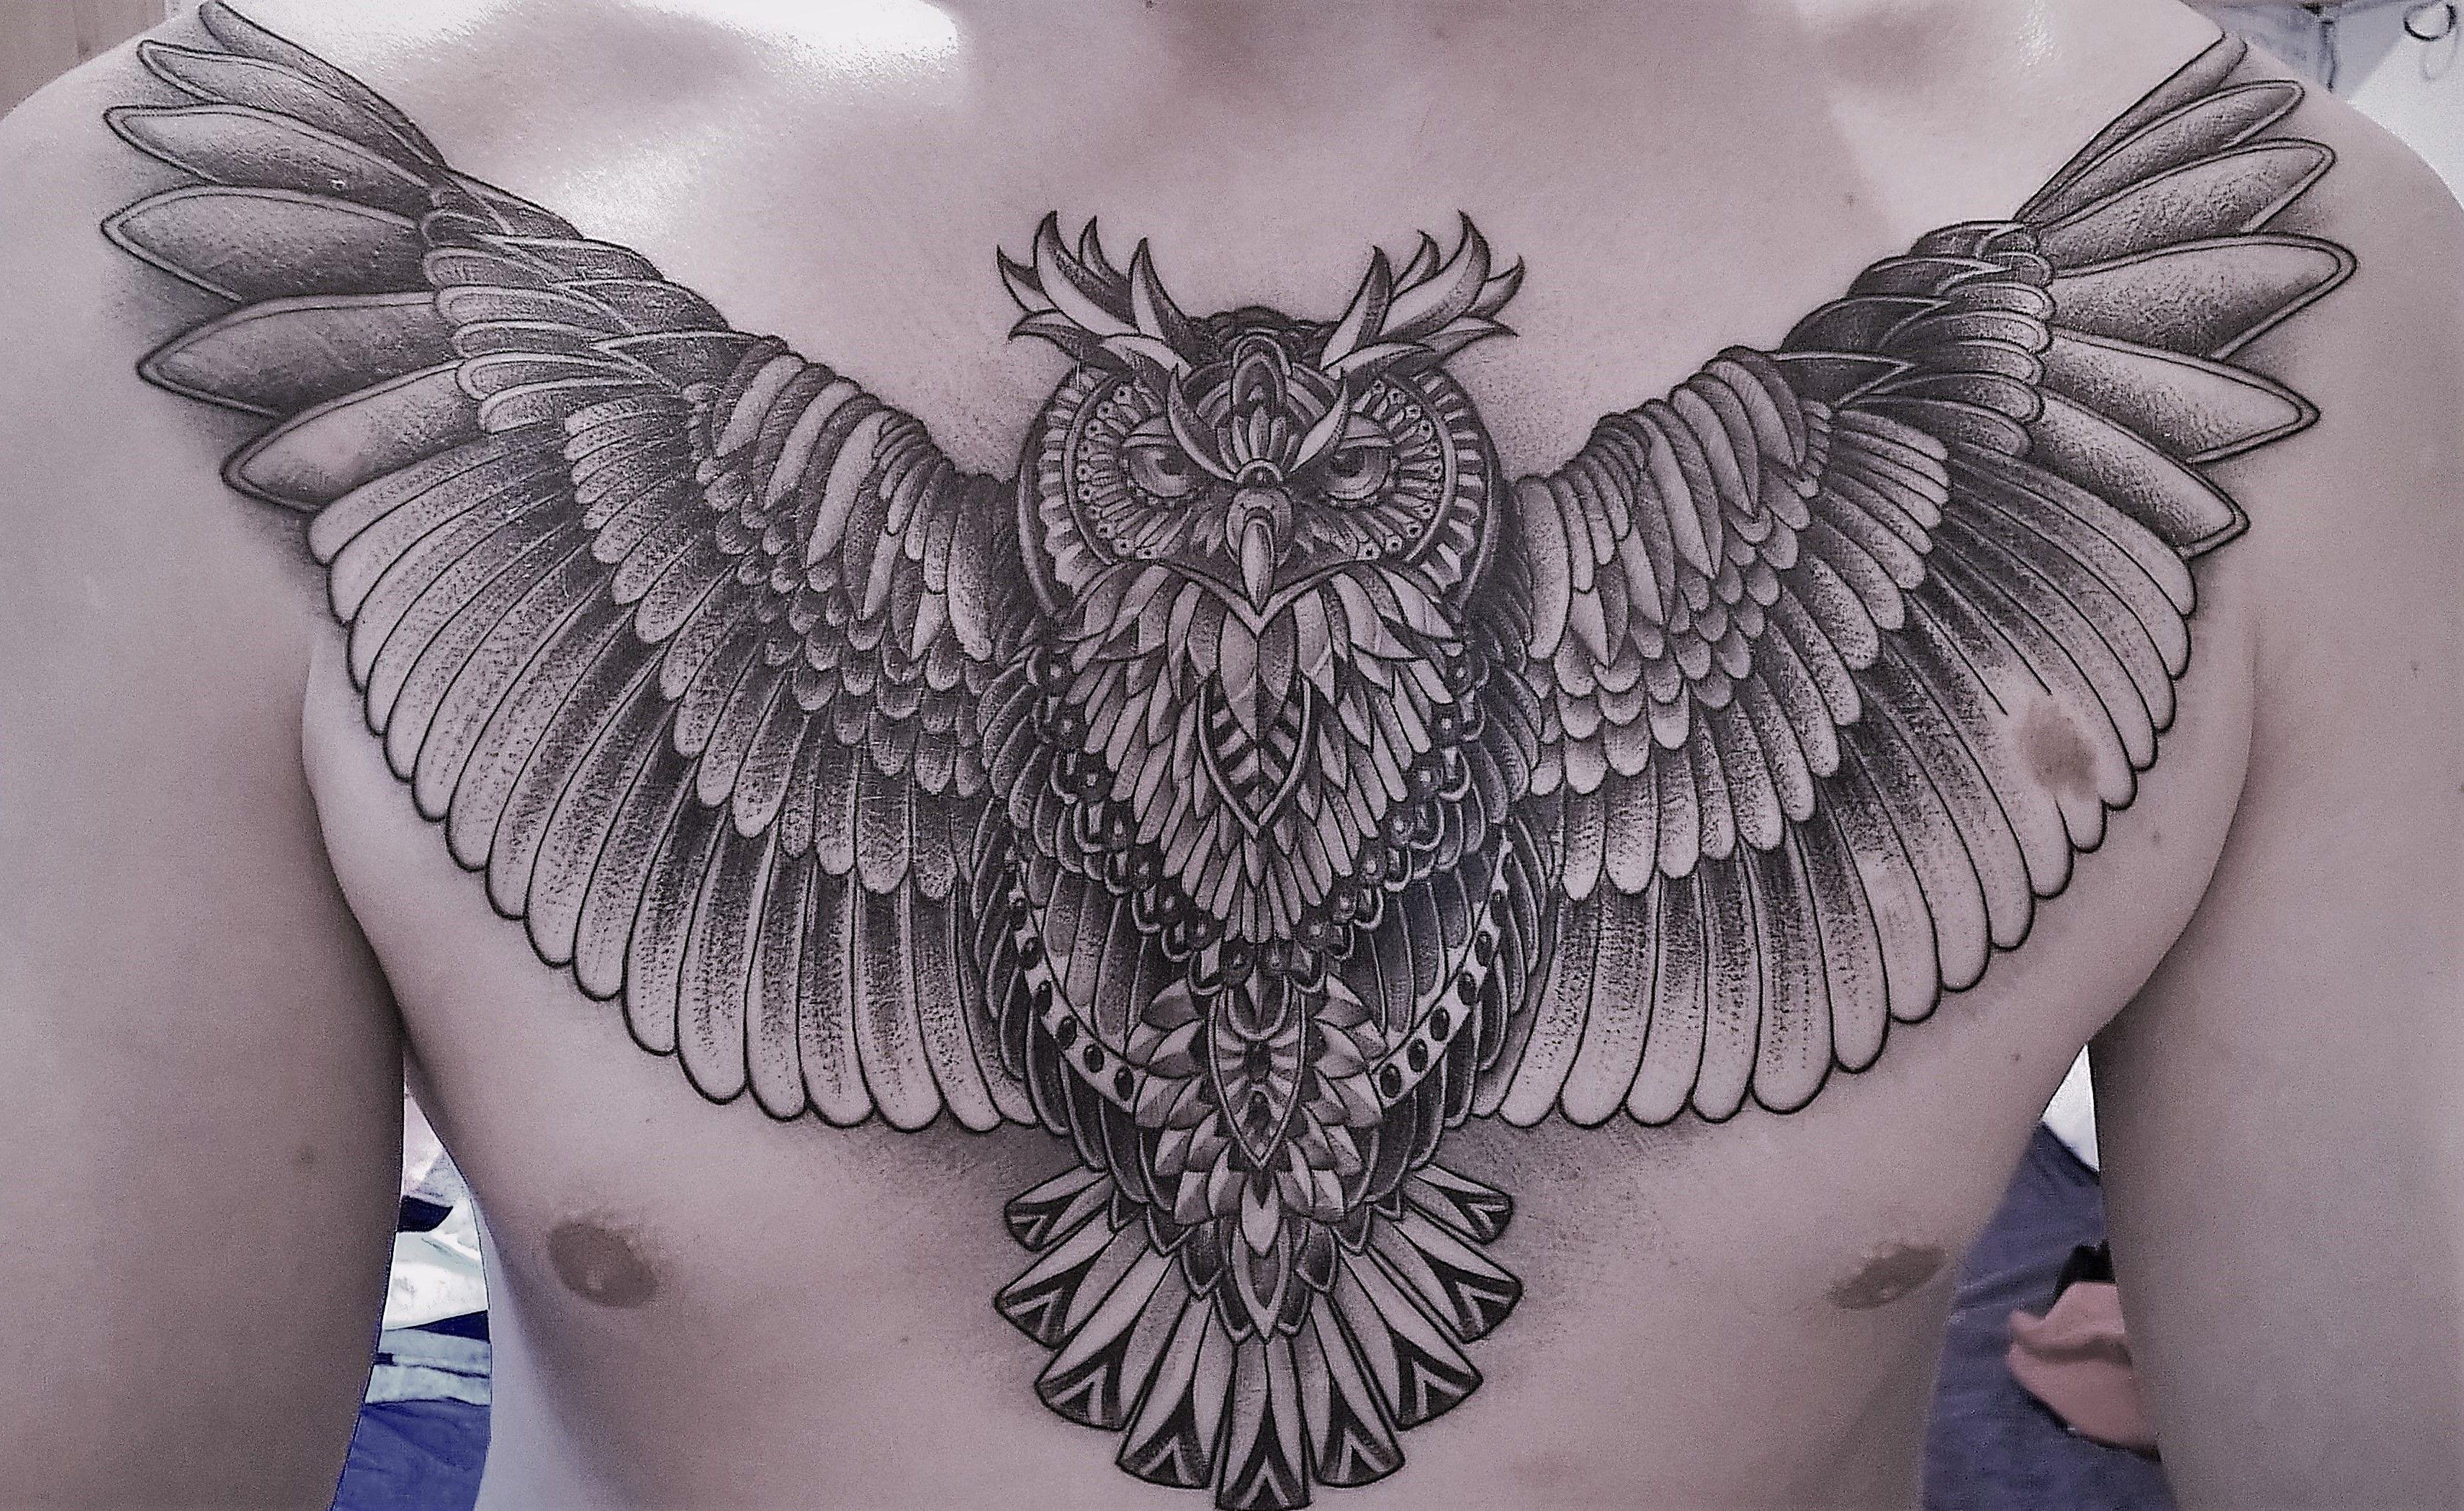 Geometric Owl Chest Tattoo In Dotwork Style Tattoosmenschest in dimensions 3422 X 2099